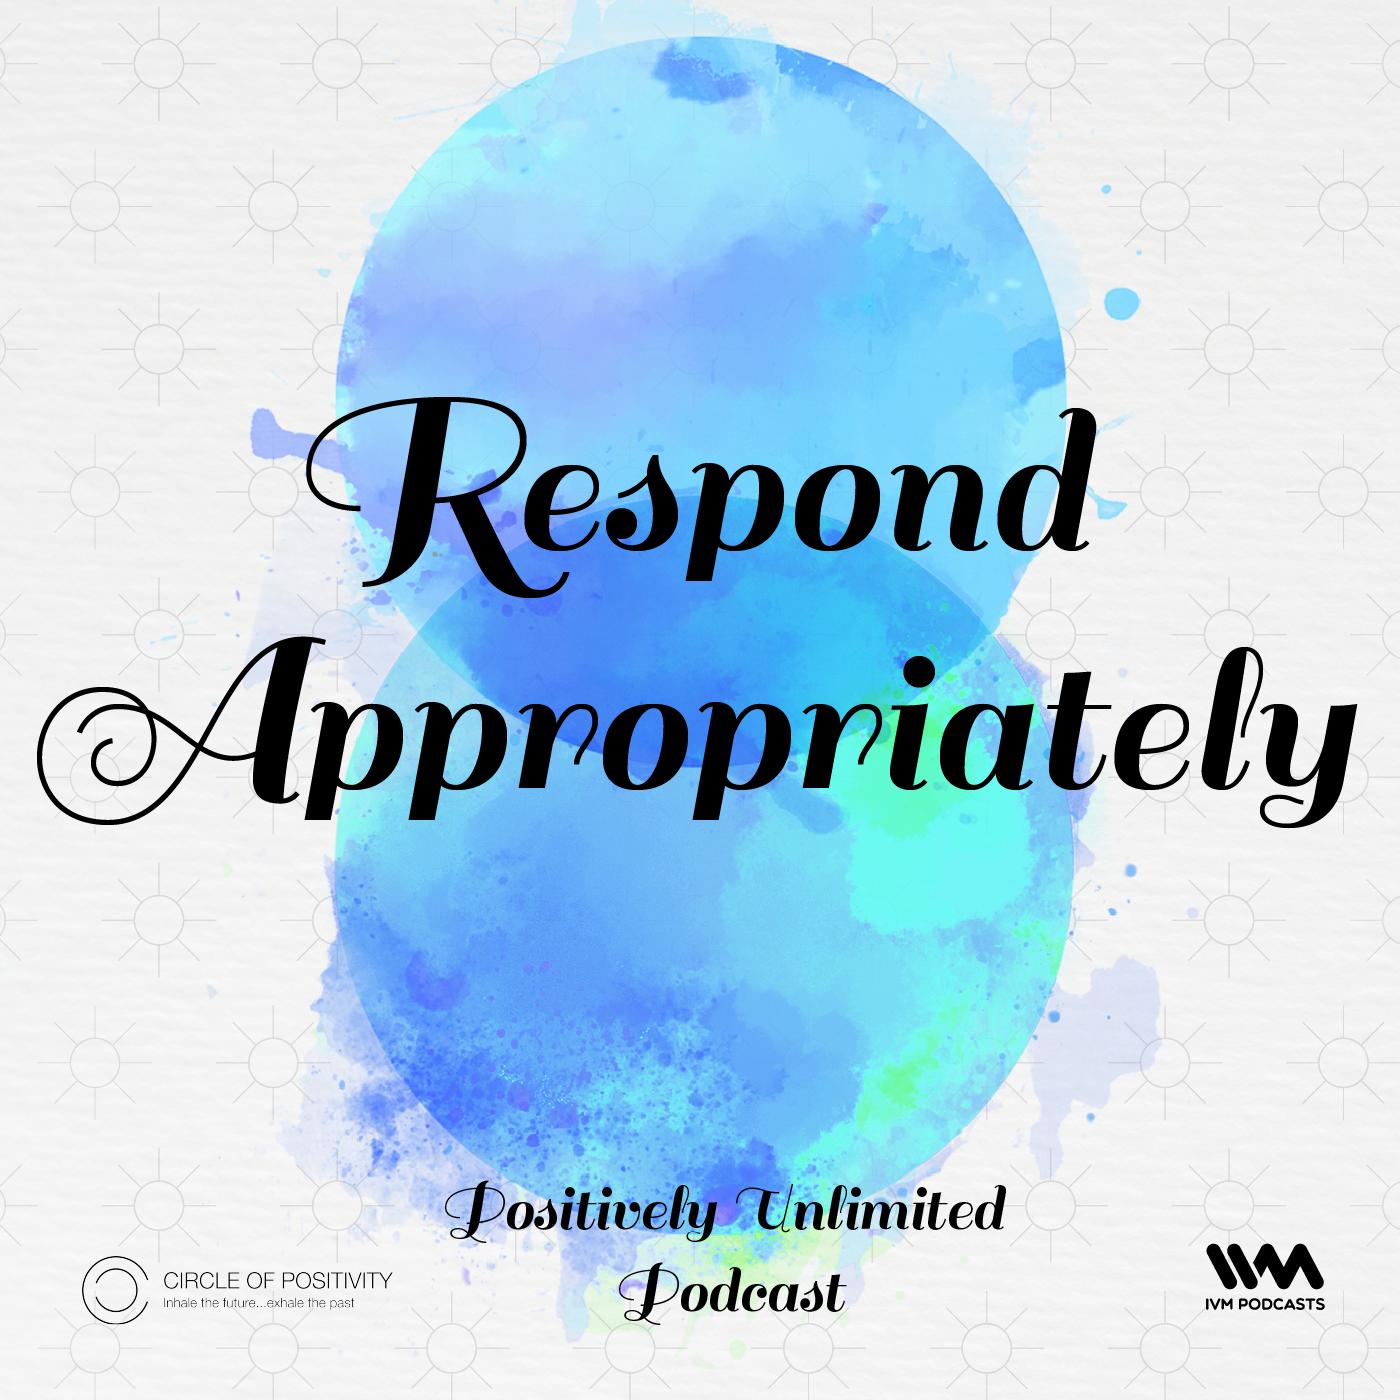 Ep. 97: Respond Appropriately